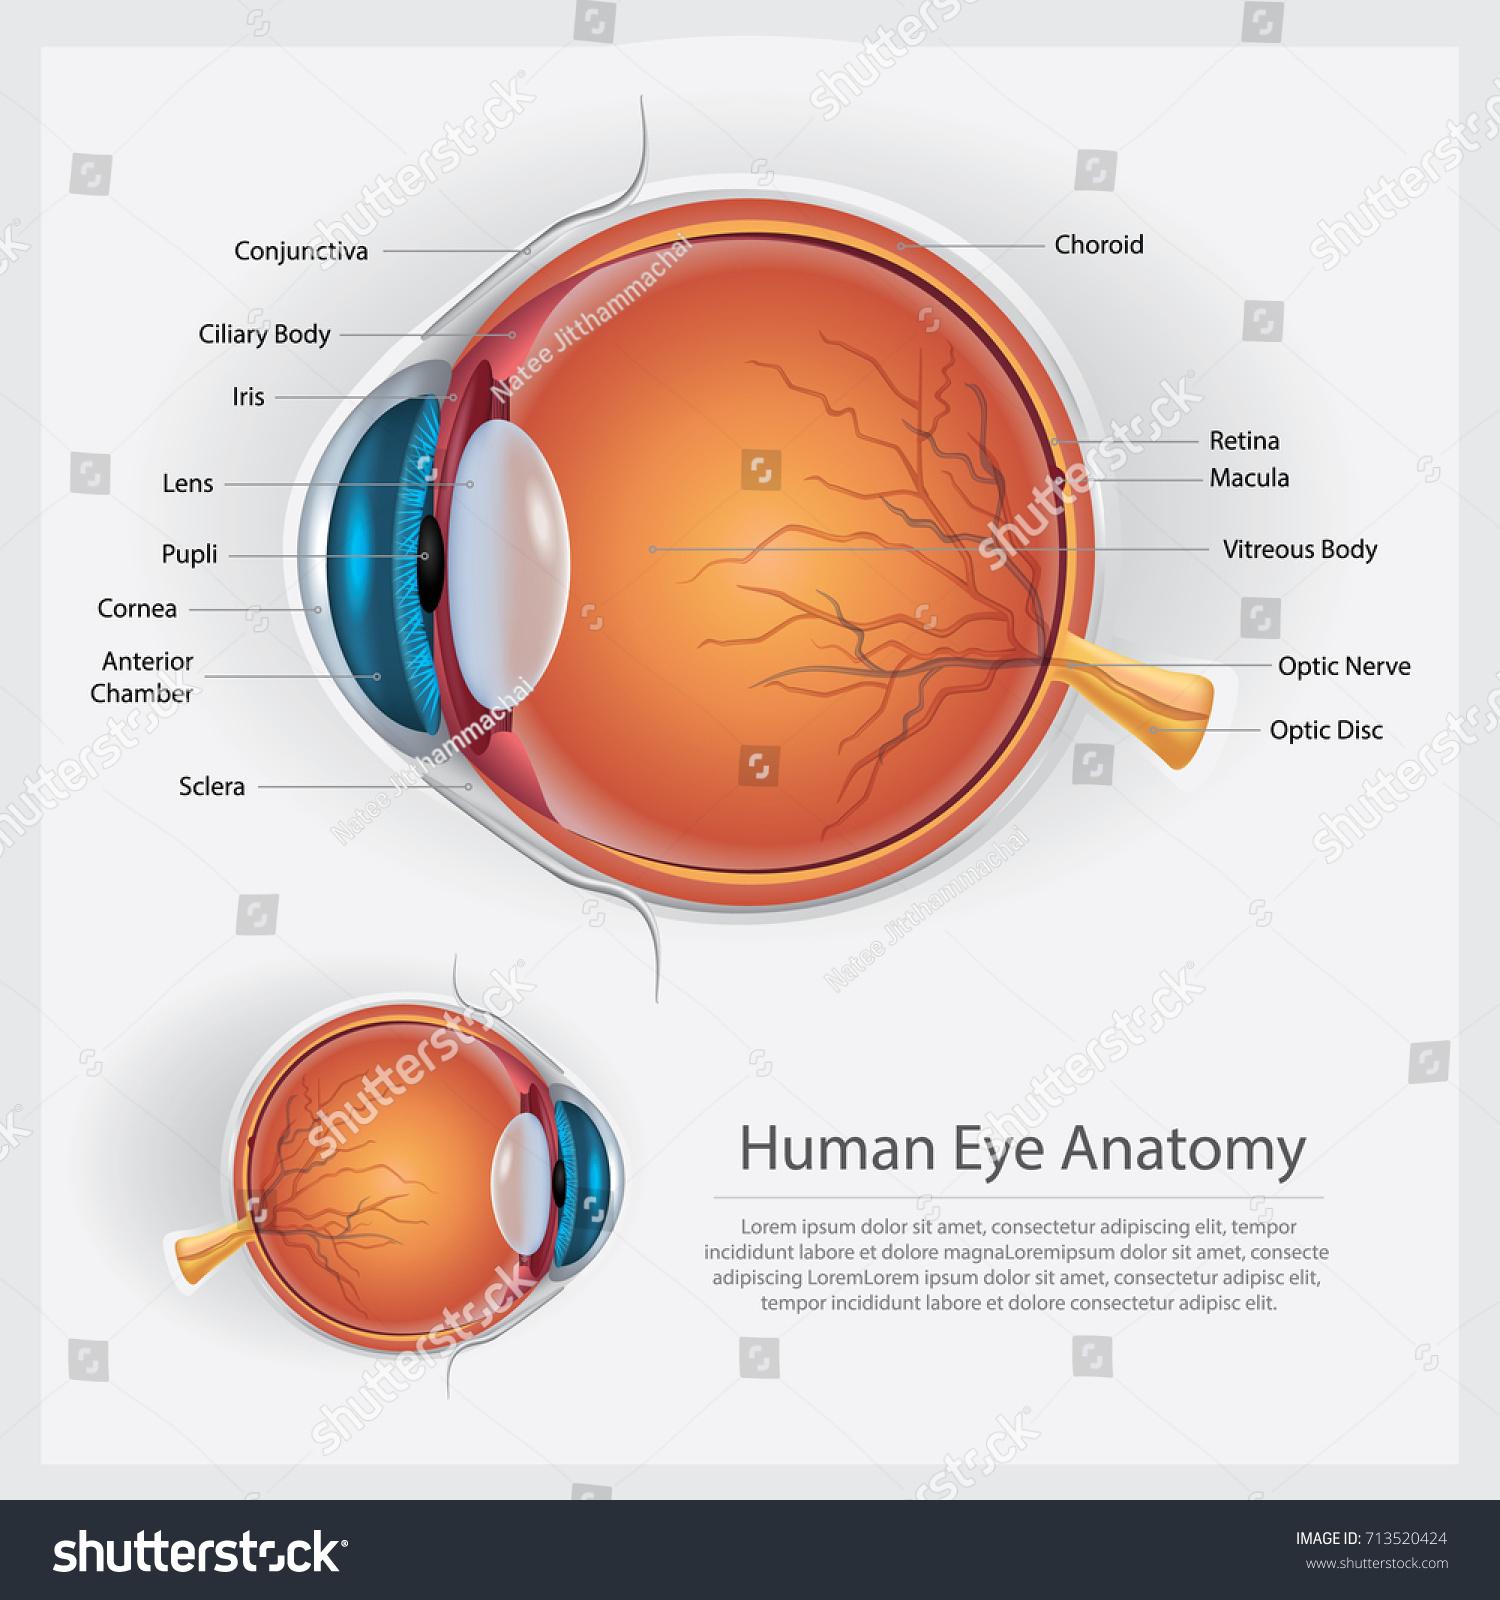 Human Eye Anatomy Vector Illustration Stock Vector 713520424 ...